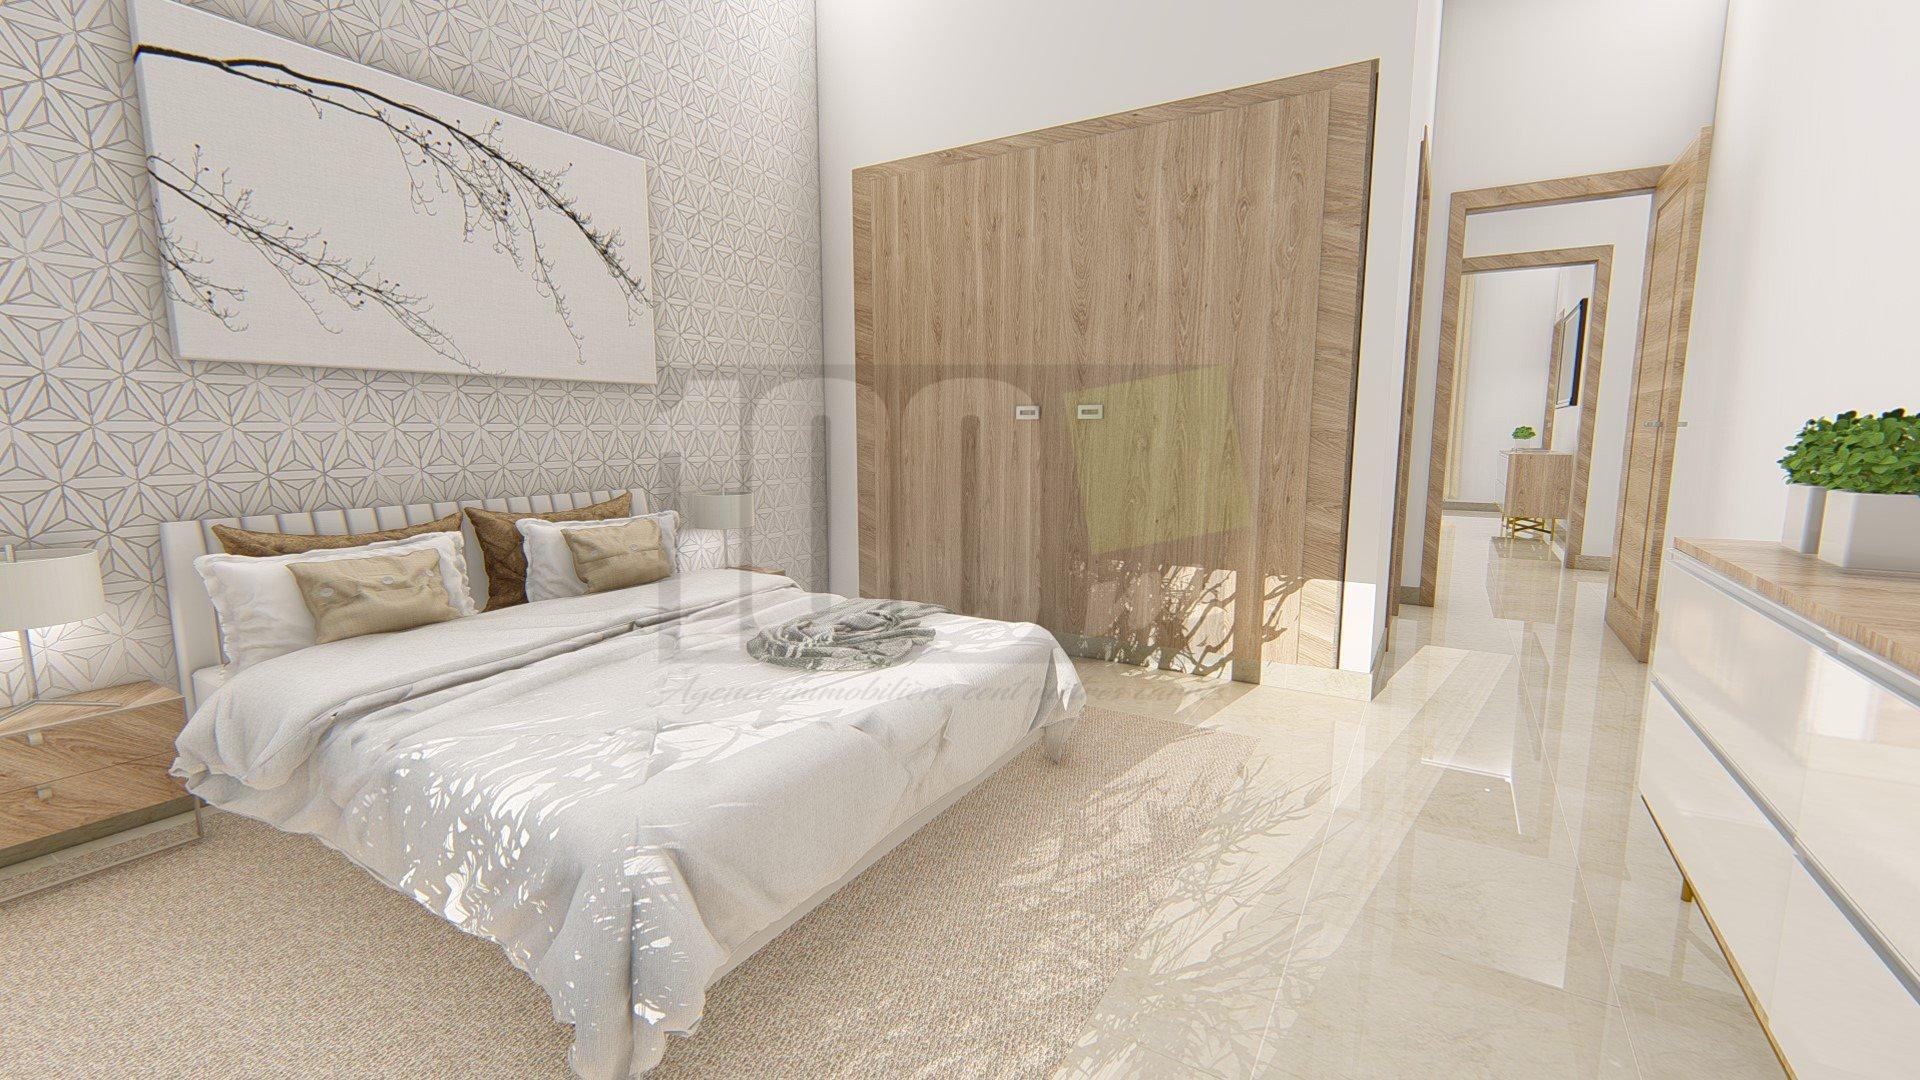 Vente appartement S+2 neuf de 120,8 m² à Ain Zaghouan